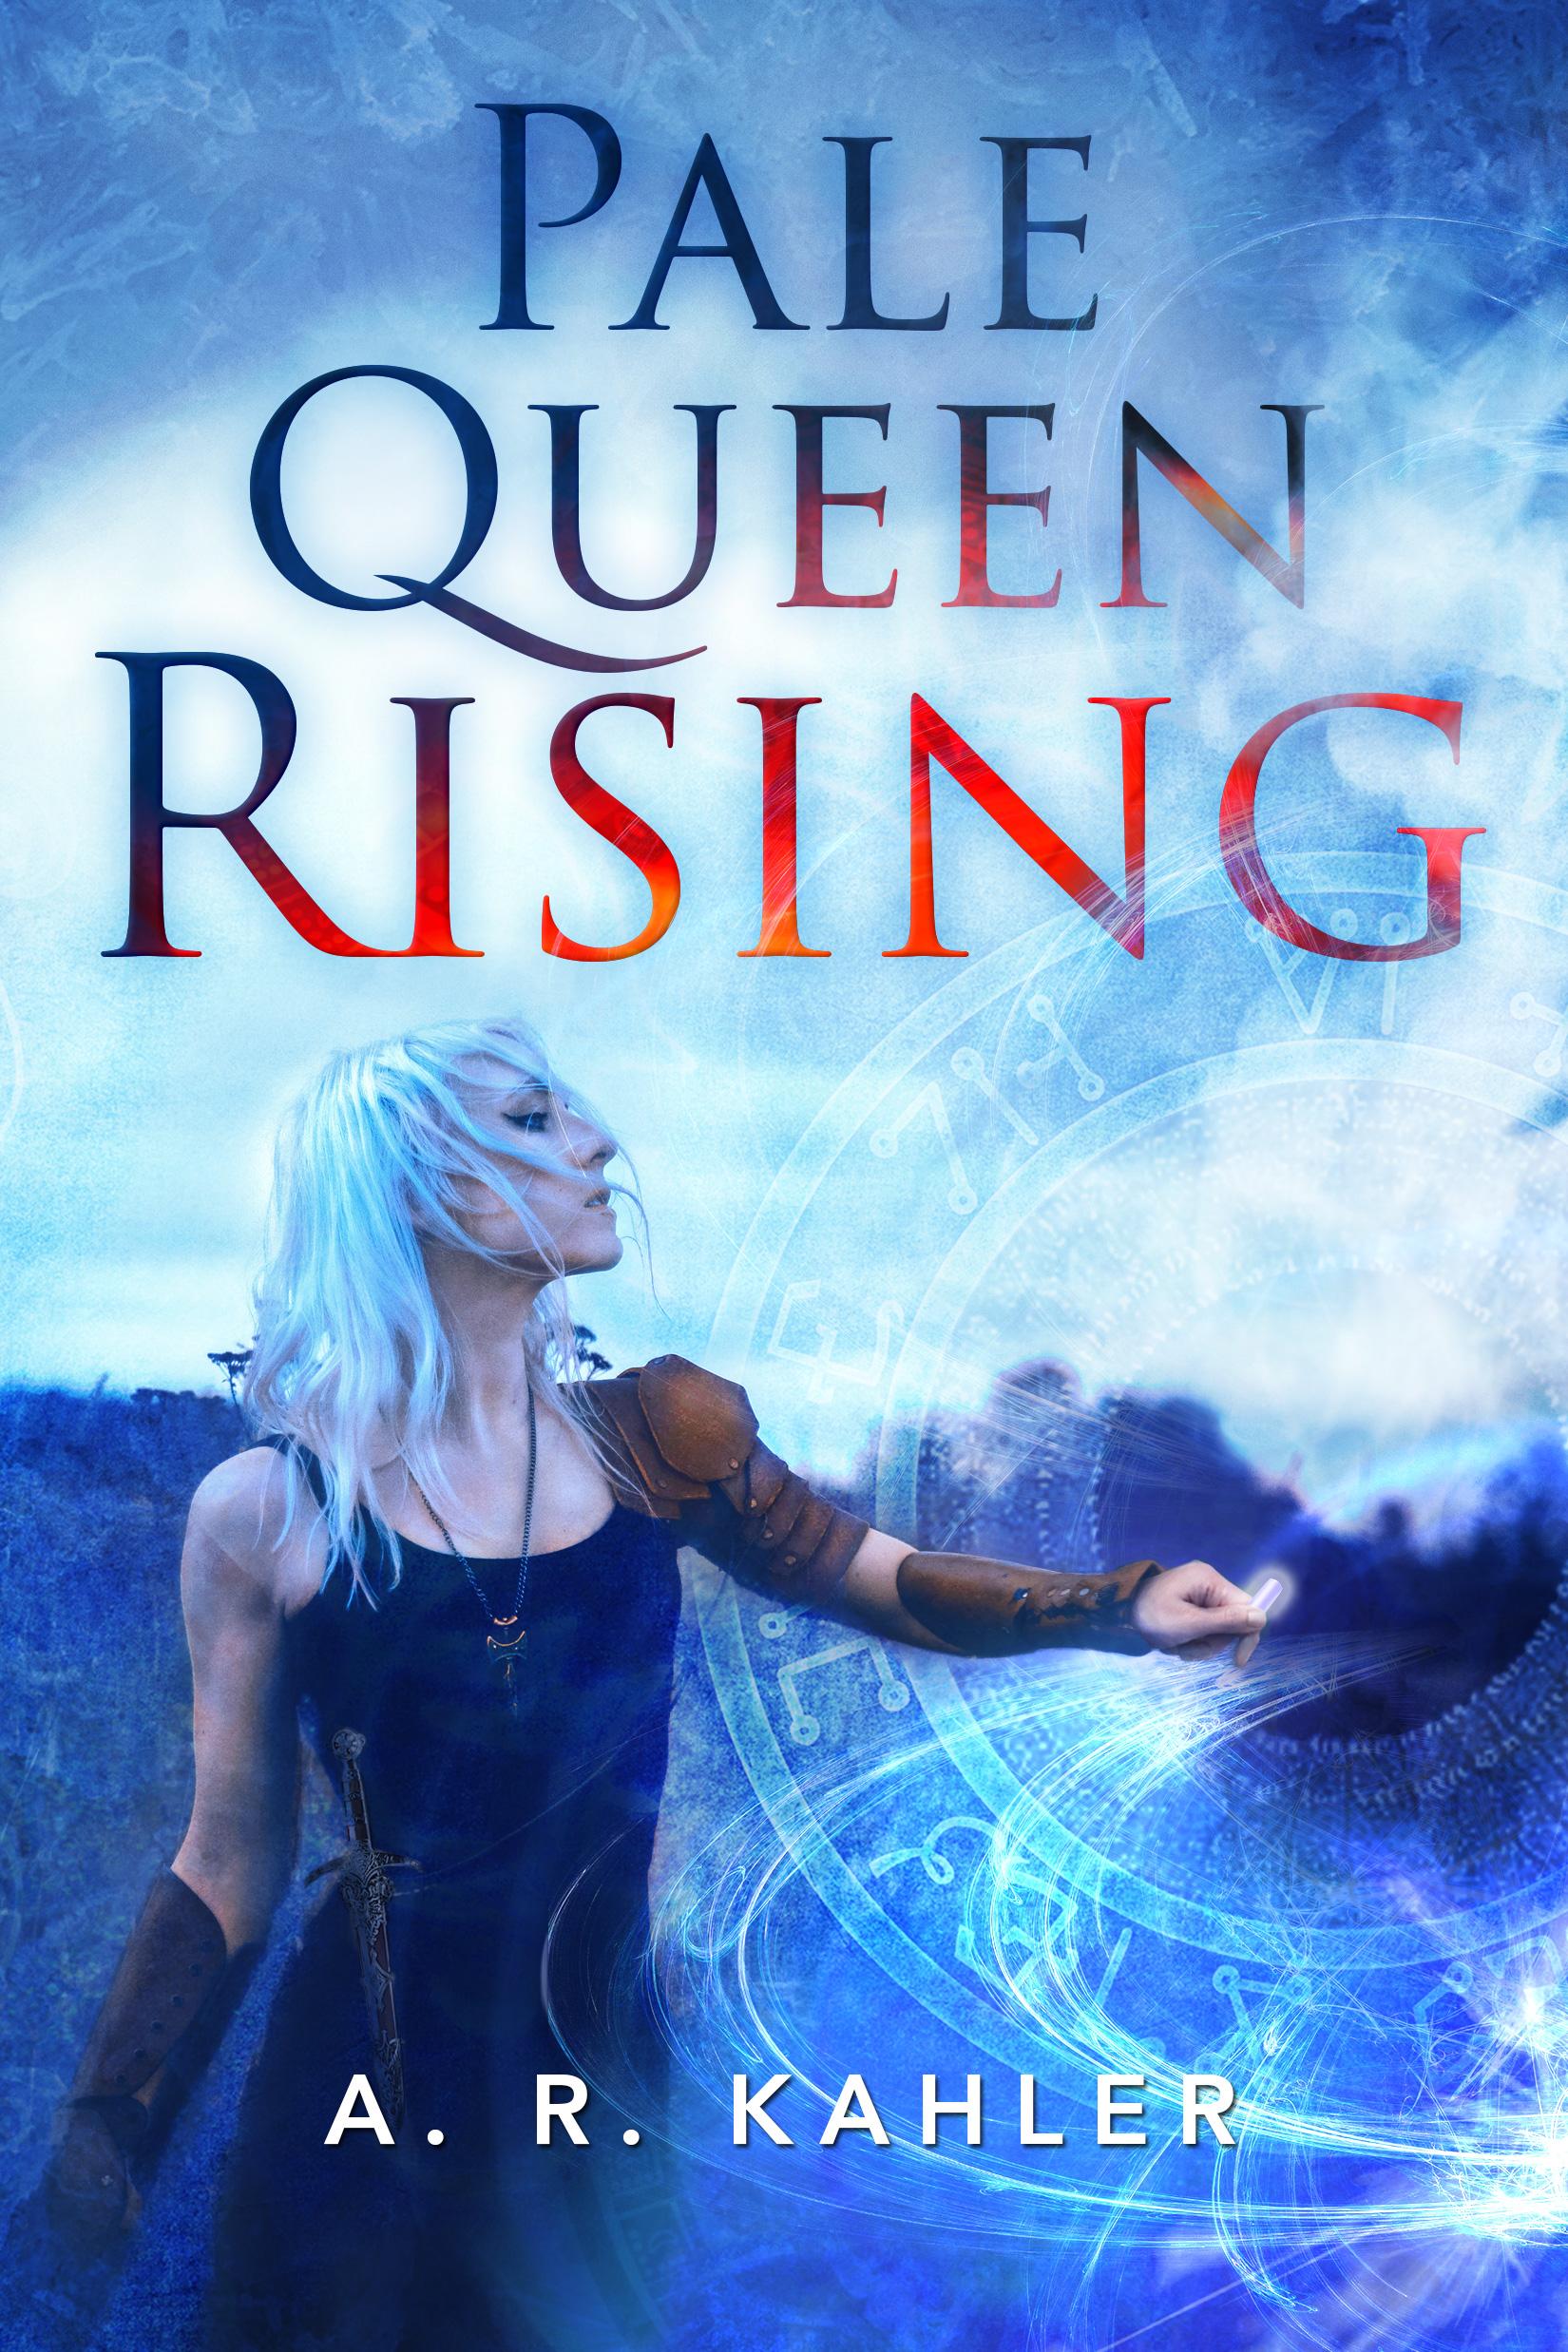 Pale Queen Rising.jpg